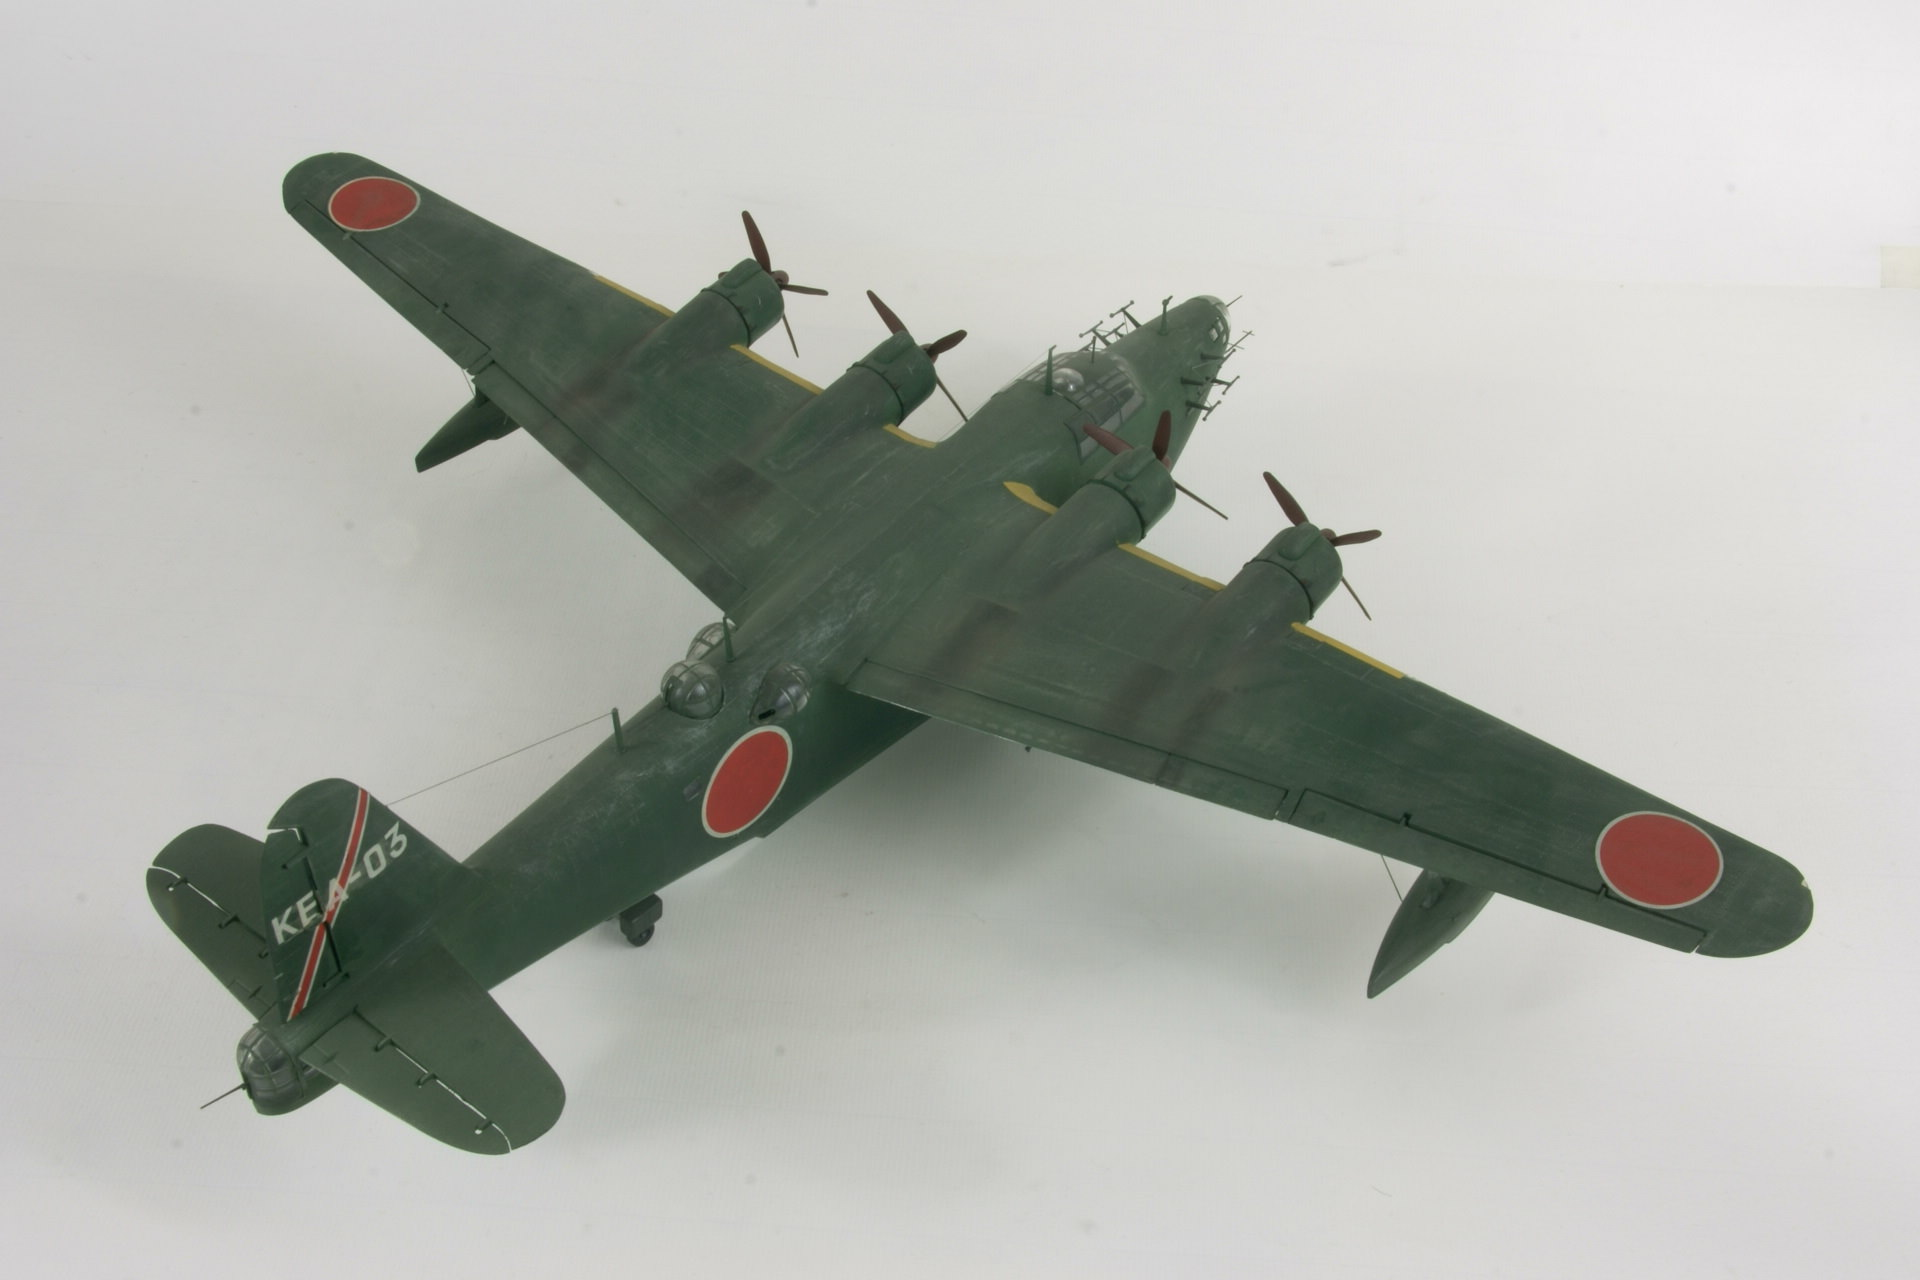 Kawanishi h8k2 model 2 2 emily 9